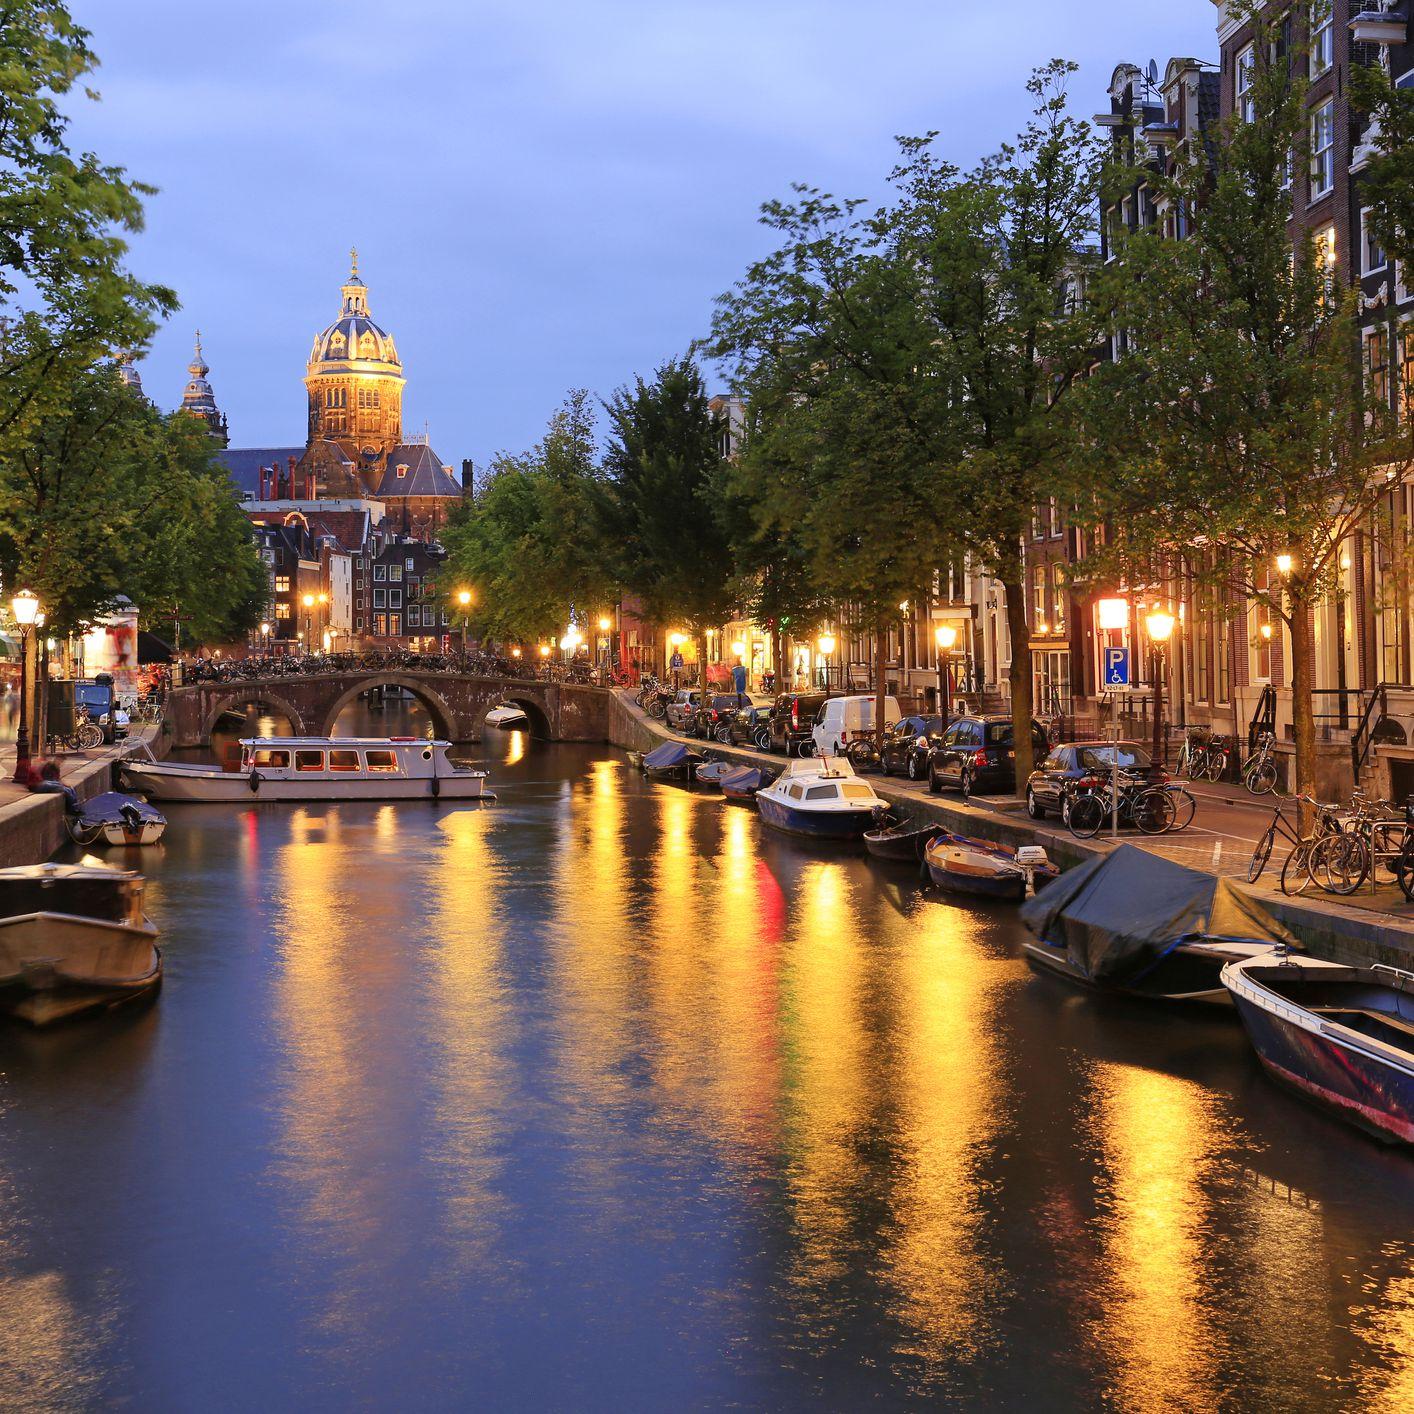 Nightlife in Amsterdam: Best Bars, Clubs, & More